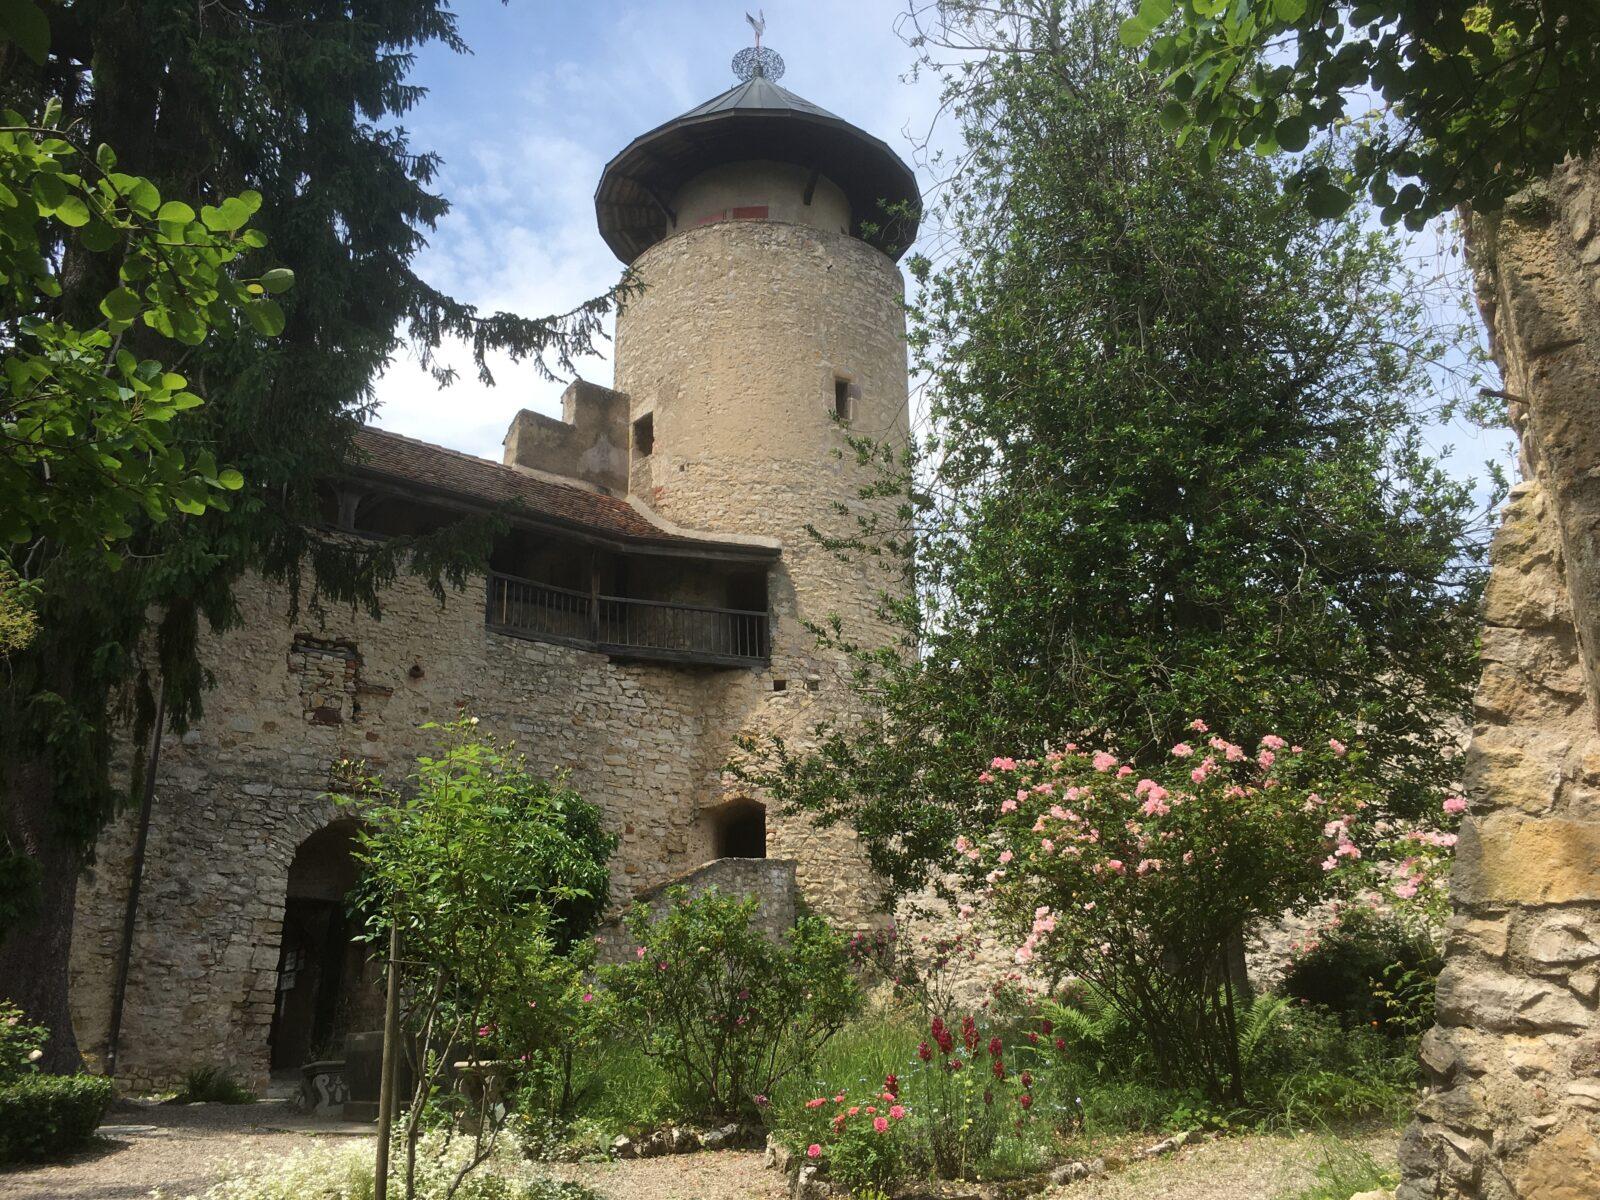 Burg Birseck Innenhof